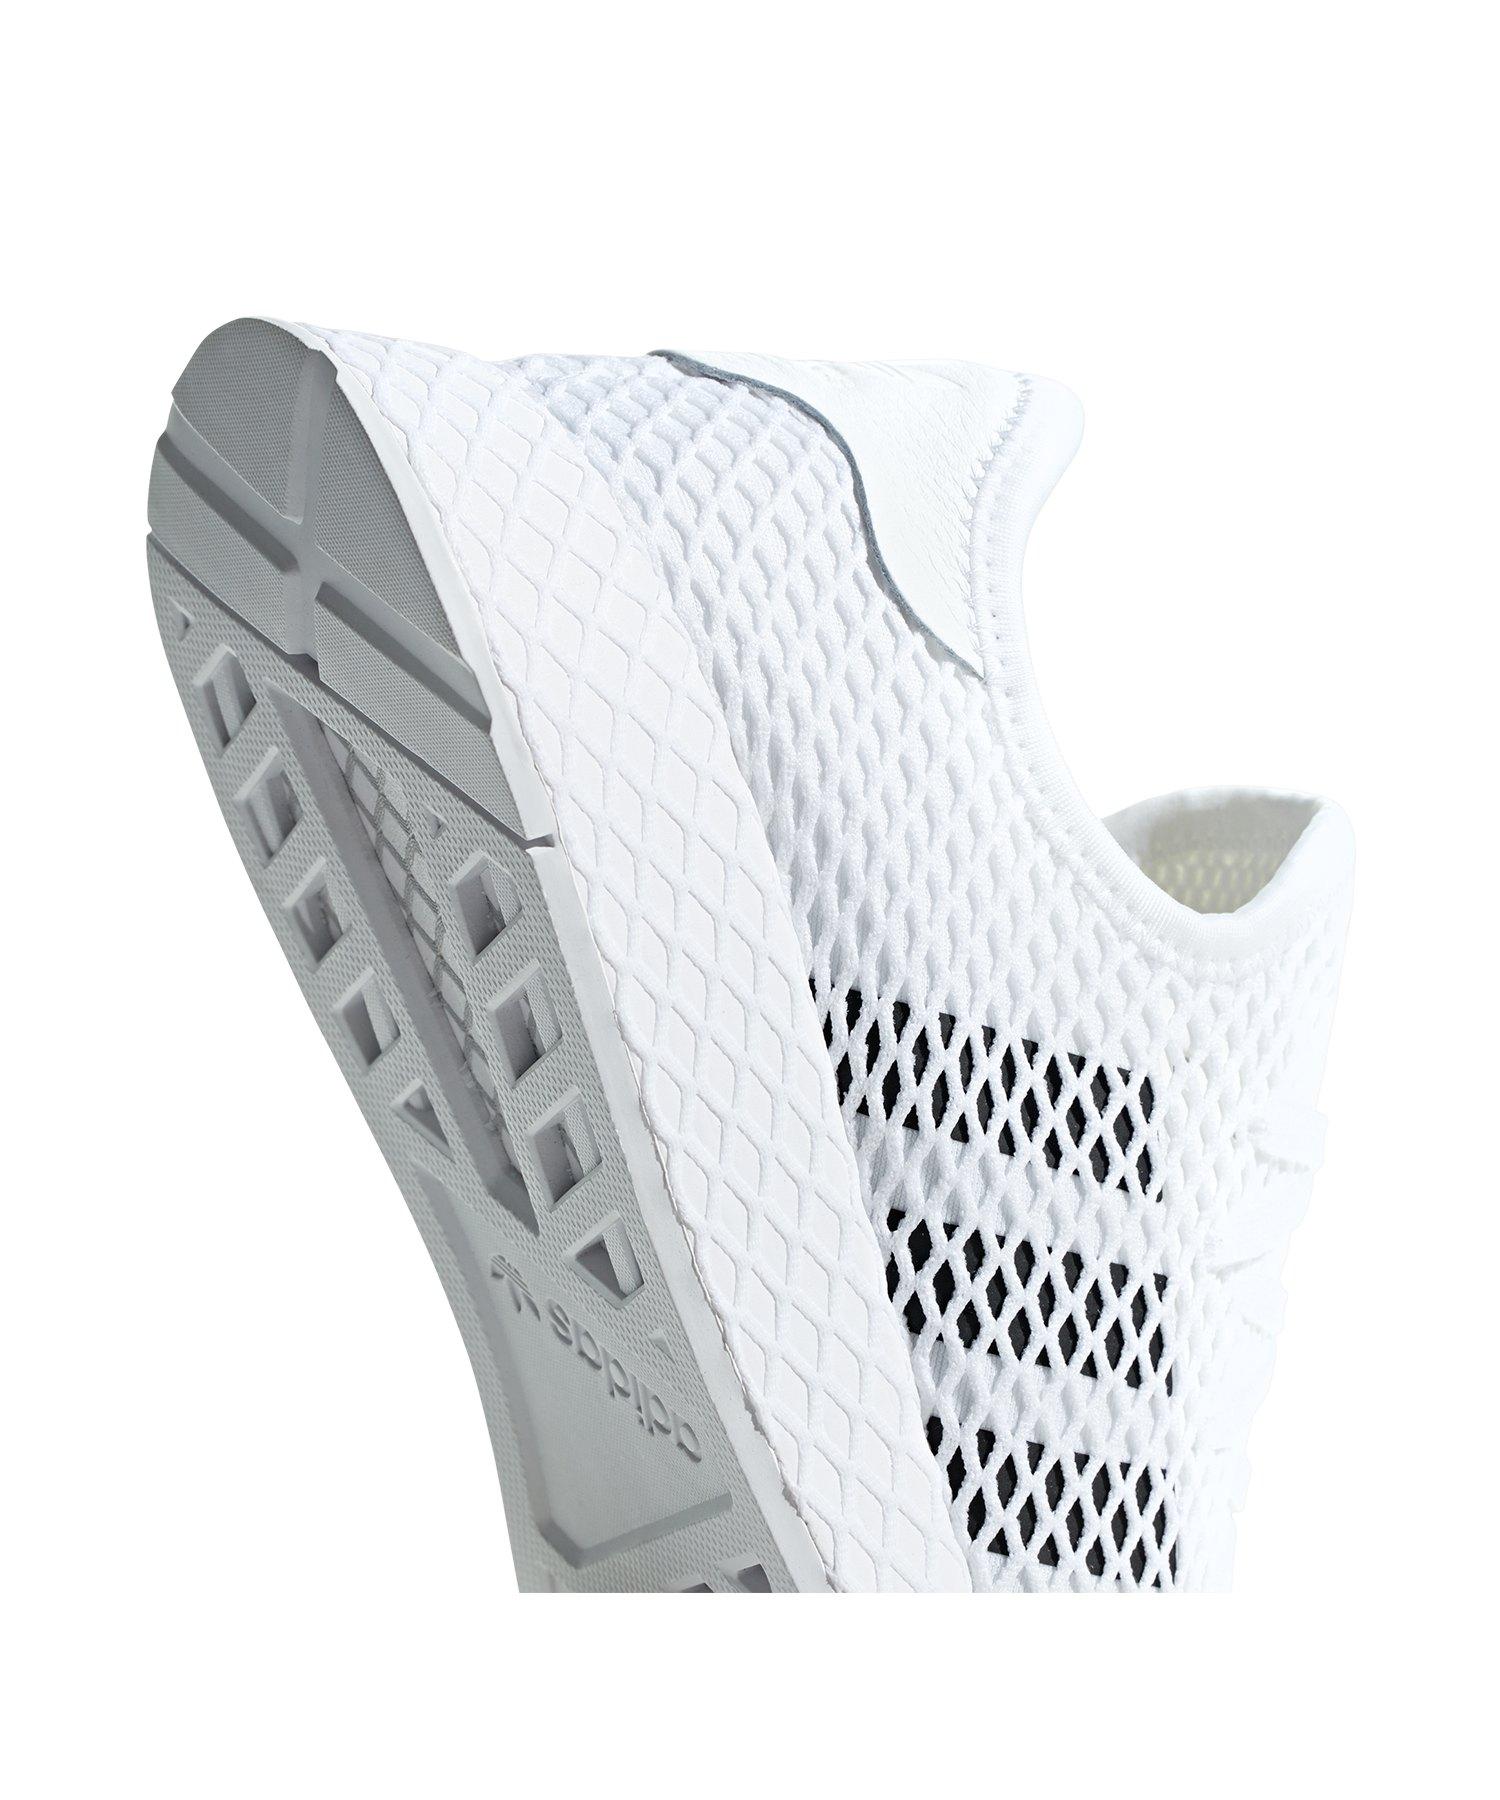 Originals Deerupt Runner Sneaker Adidas Weiss mwO0yNvP8n